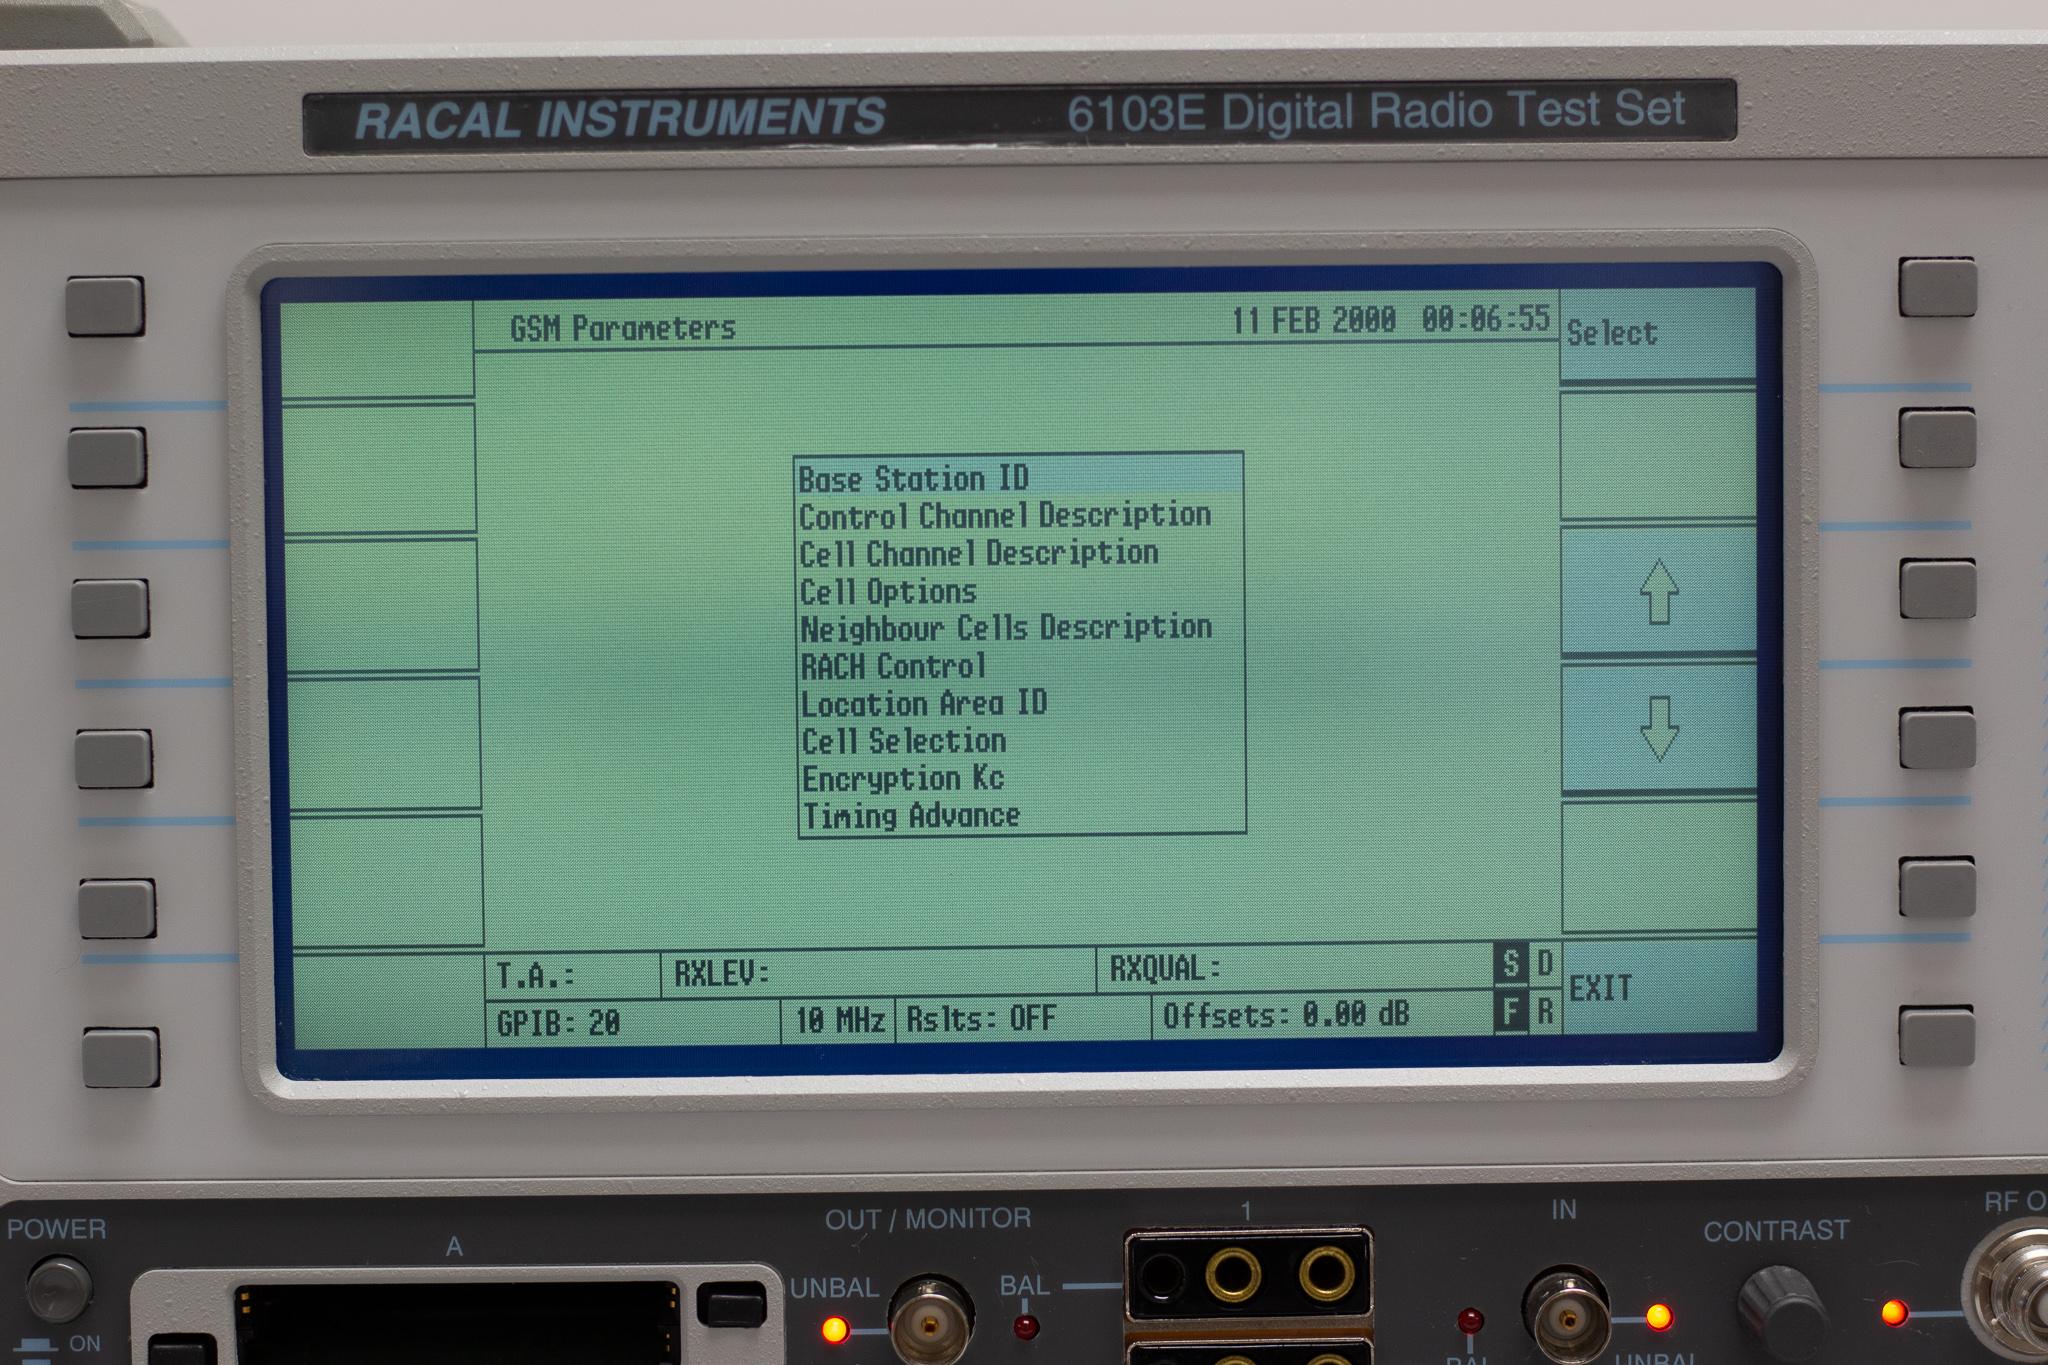 Racal Instruments 6103E / 6113E Digital Radio Test Set - RF